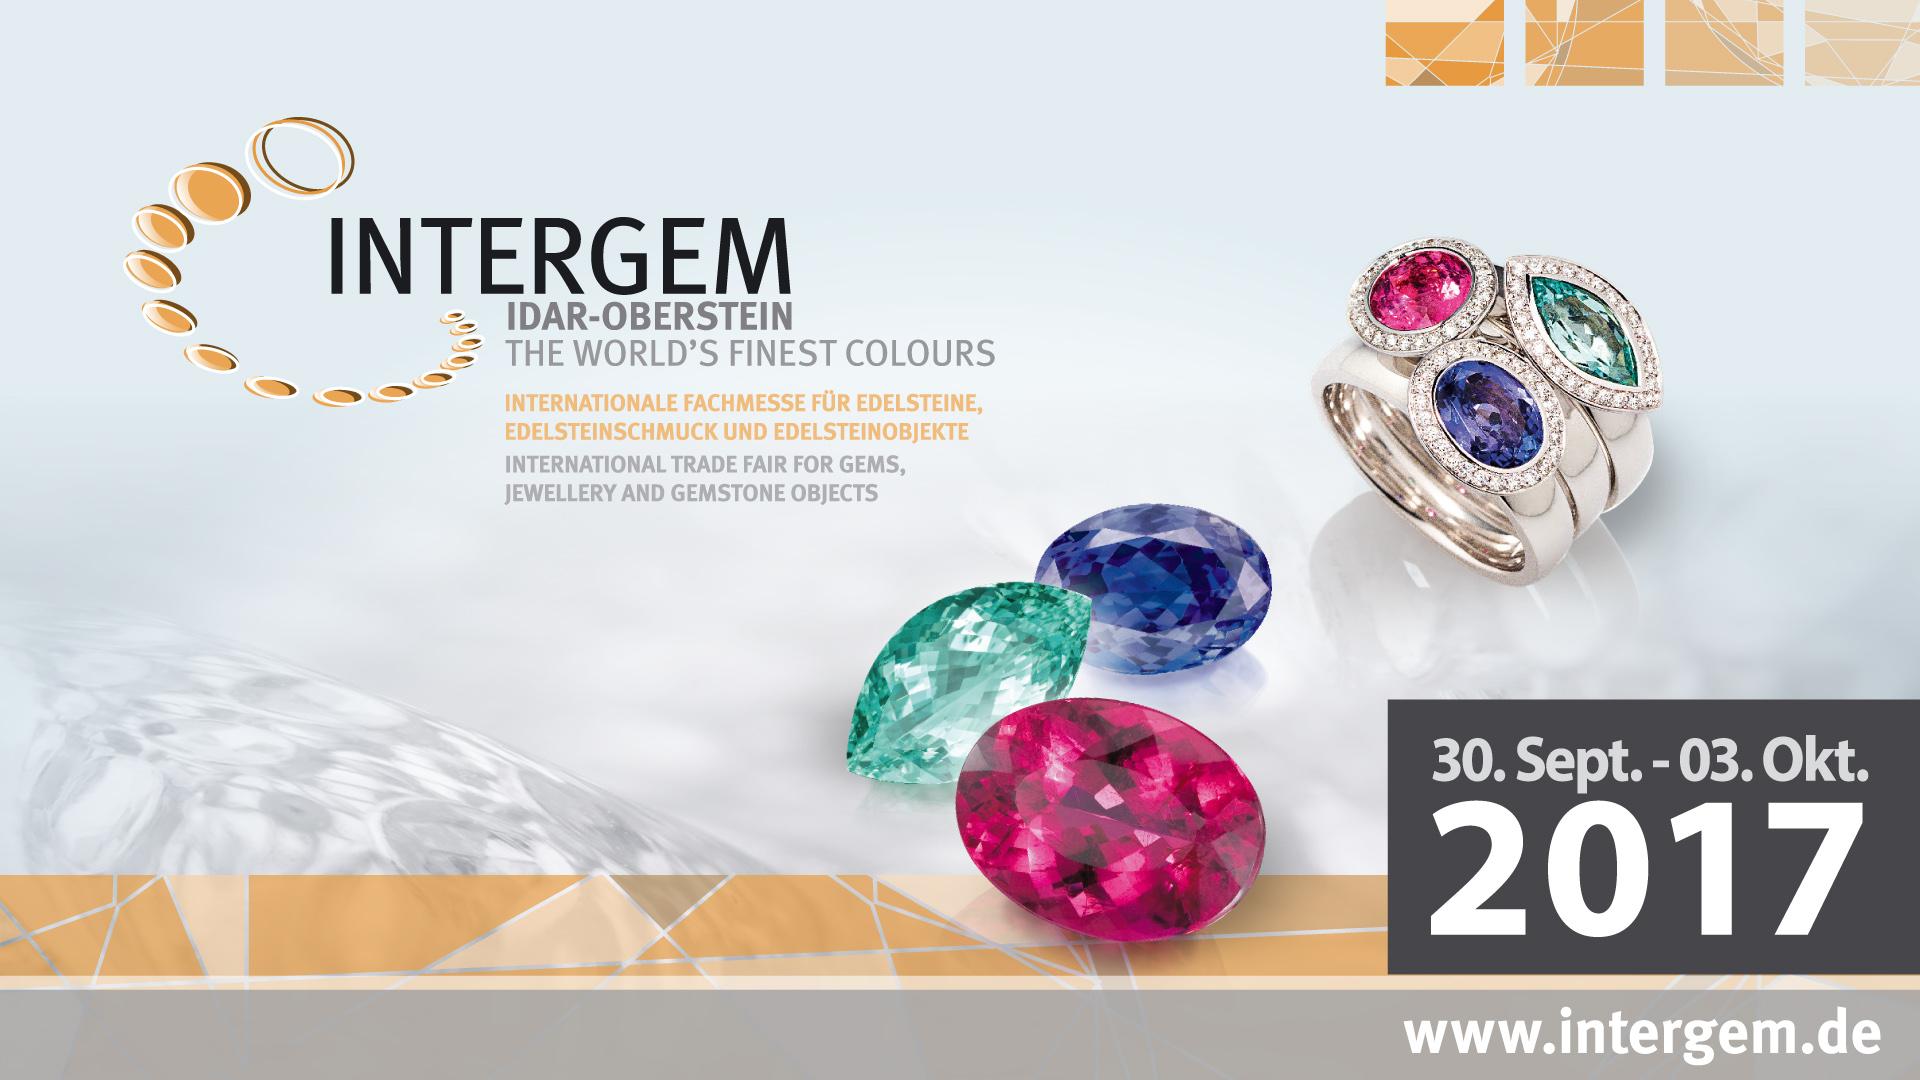 Intergem 2017 – Exhibitor presentation